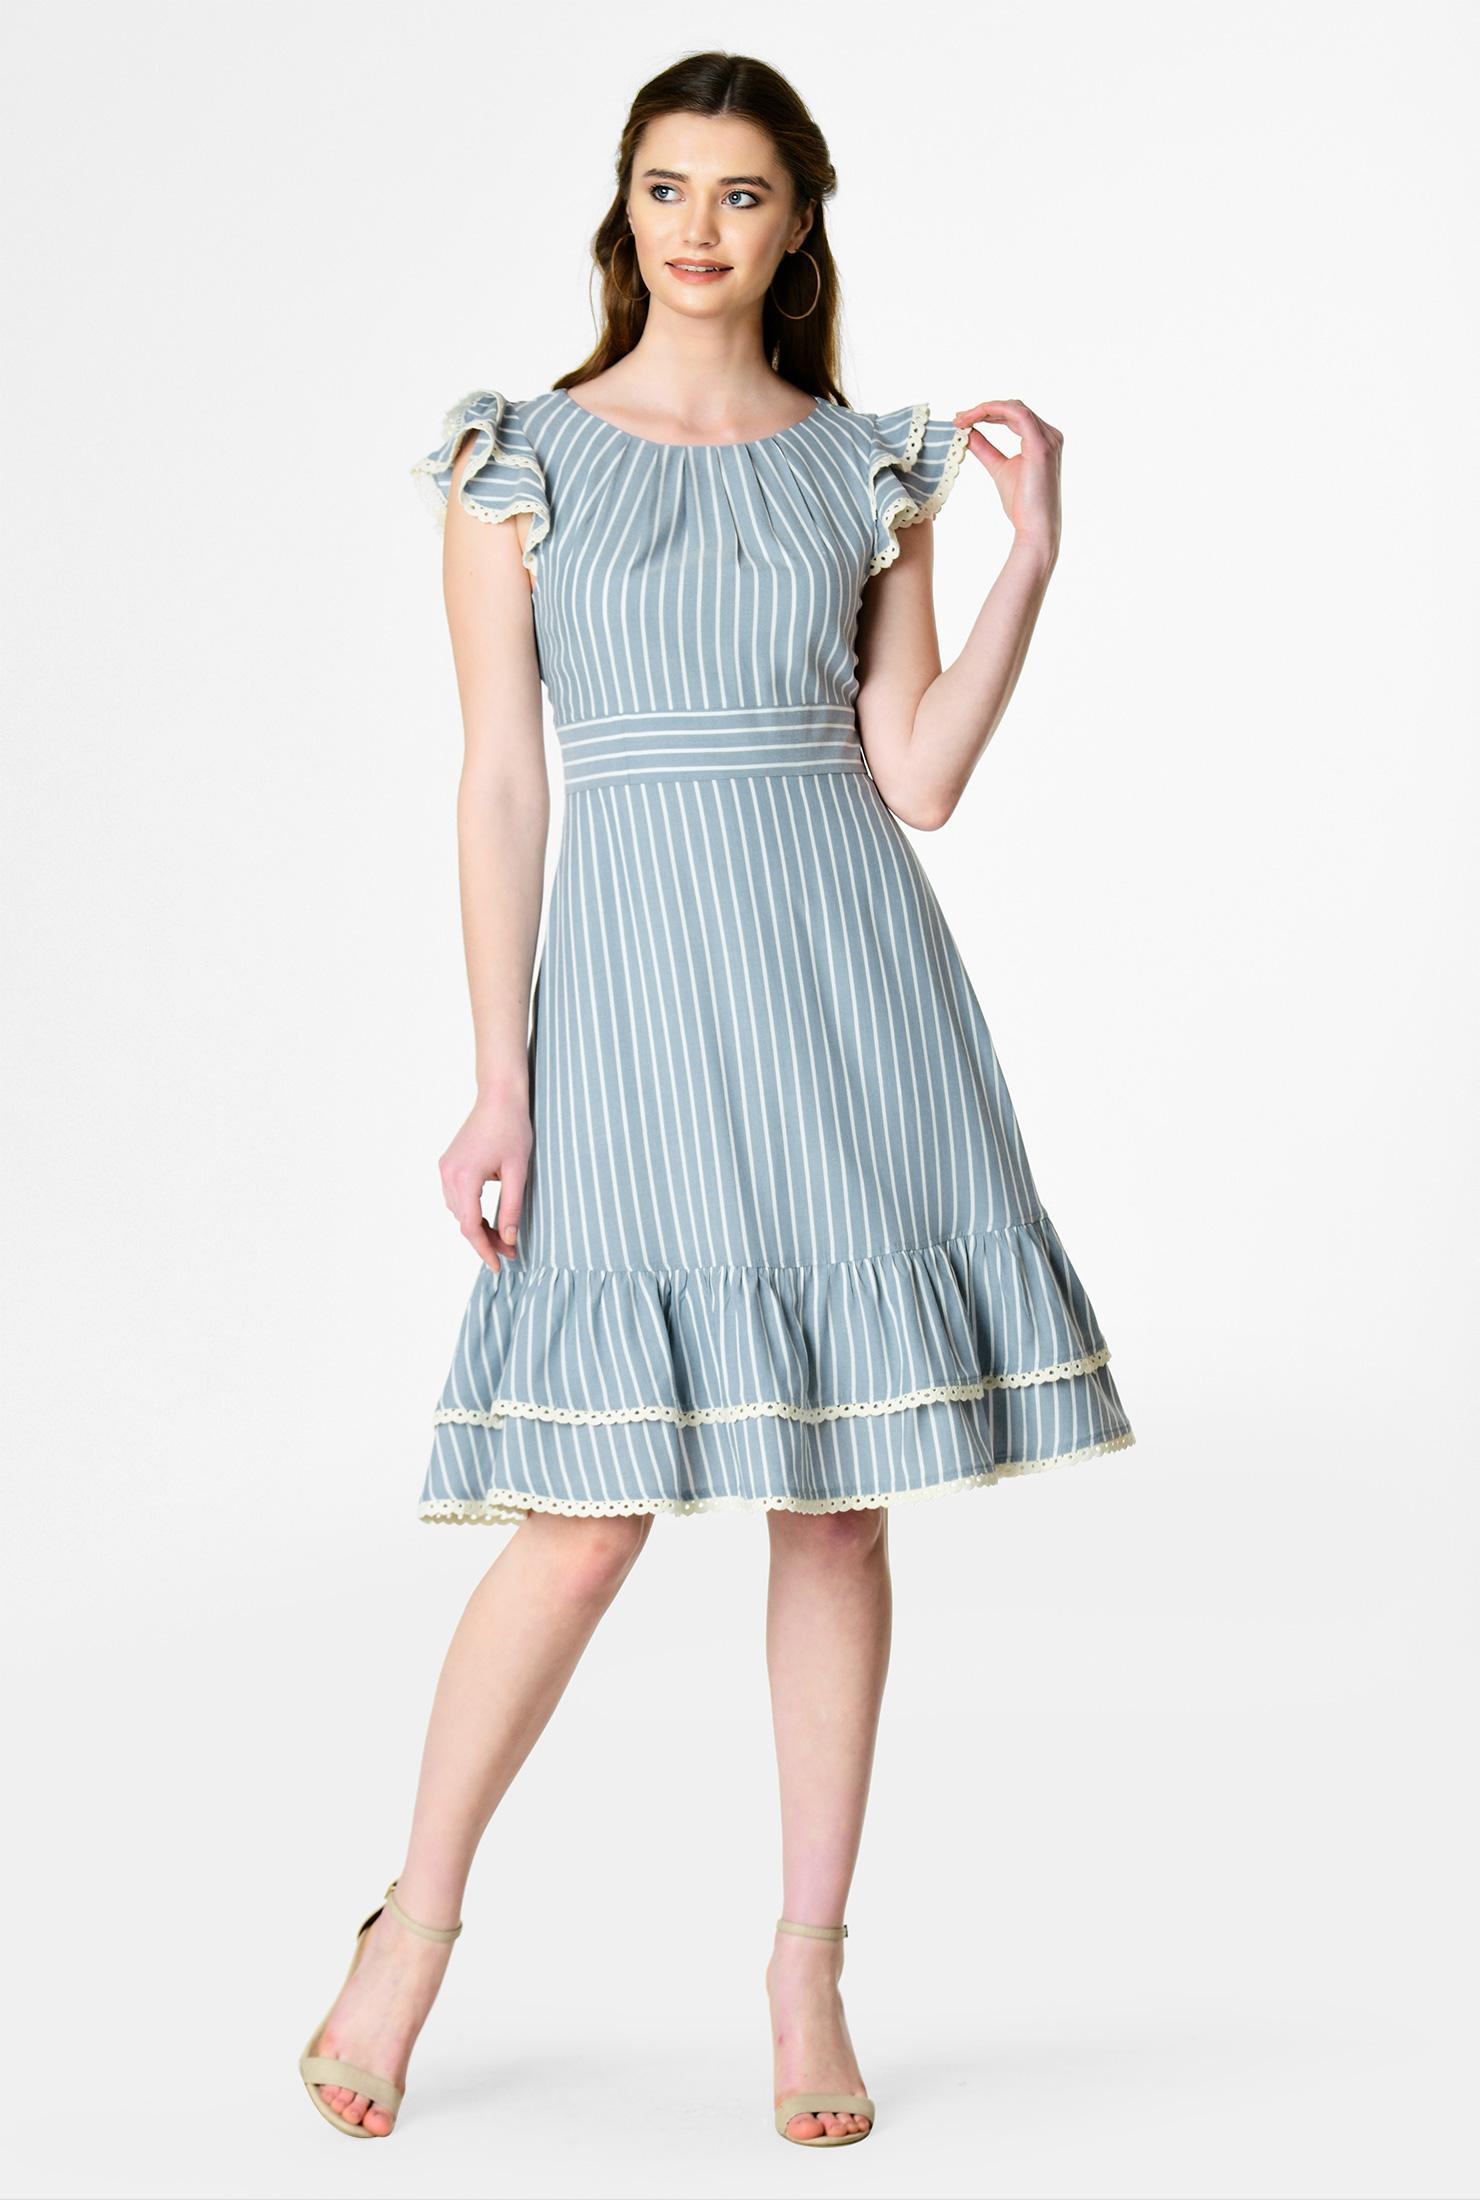 2b5349aac369 Women s Fashion Clothing 0-36W and Custom